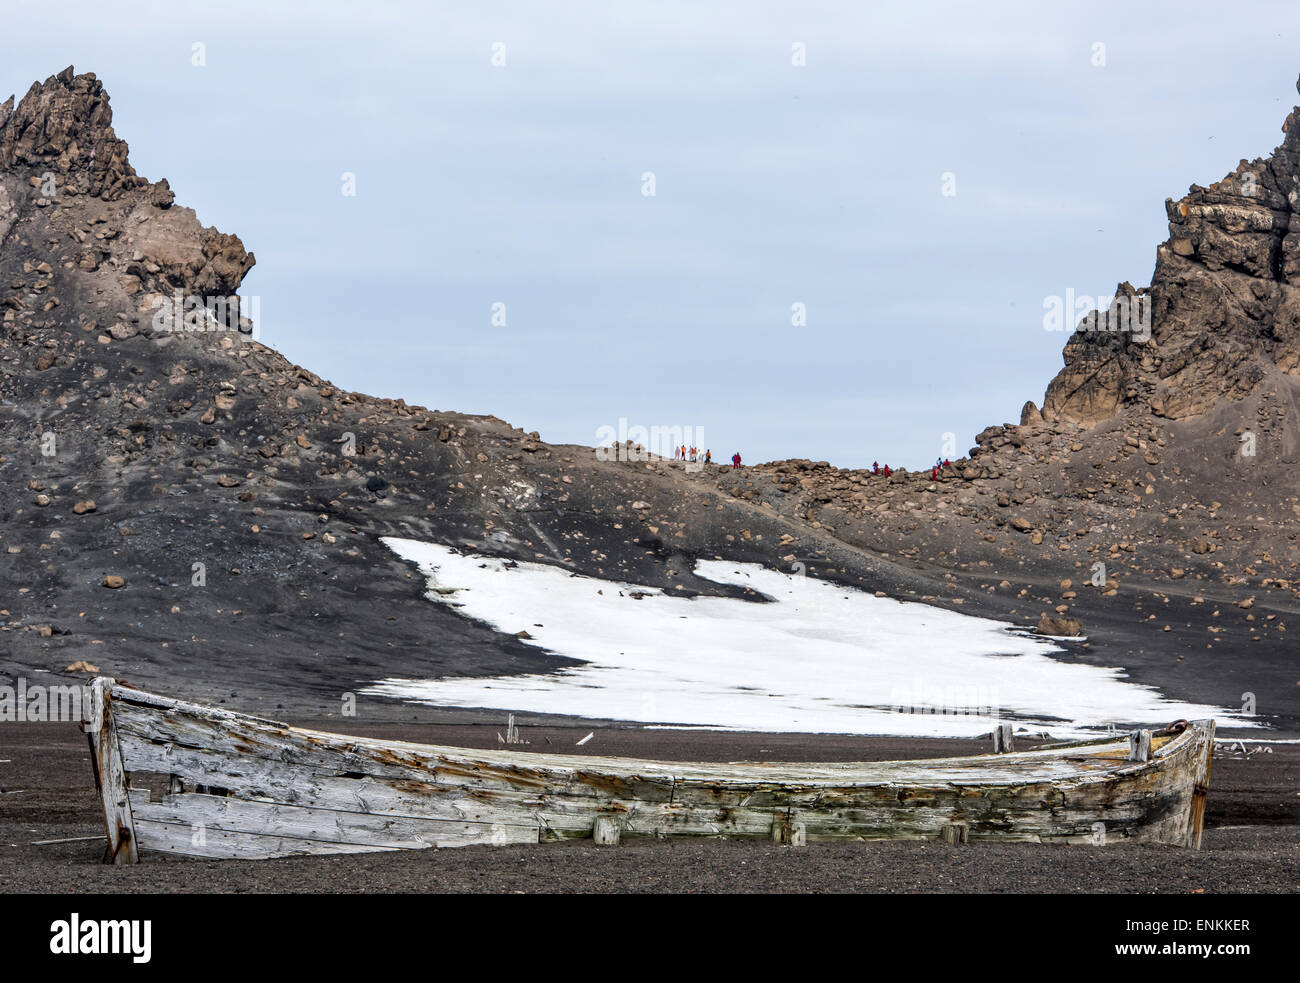 Tourists hiking Deception Island South Shetland Islands Antarctic Peninsula Antarctica - Stock Image